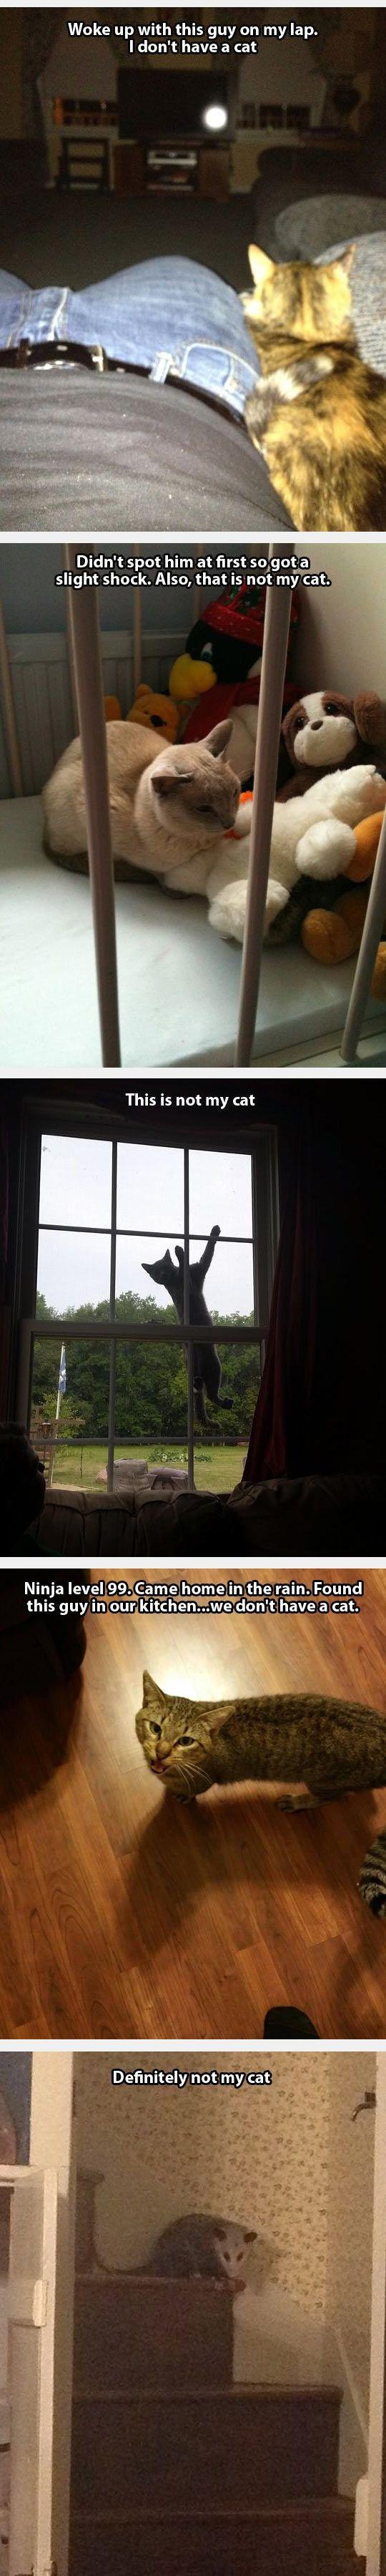 Not my cat